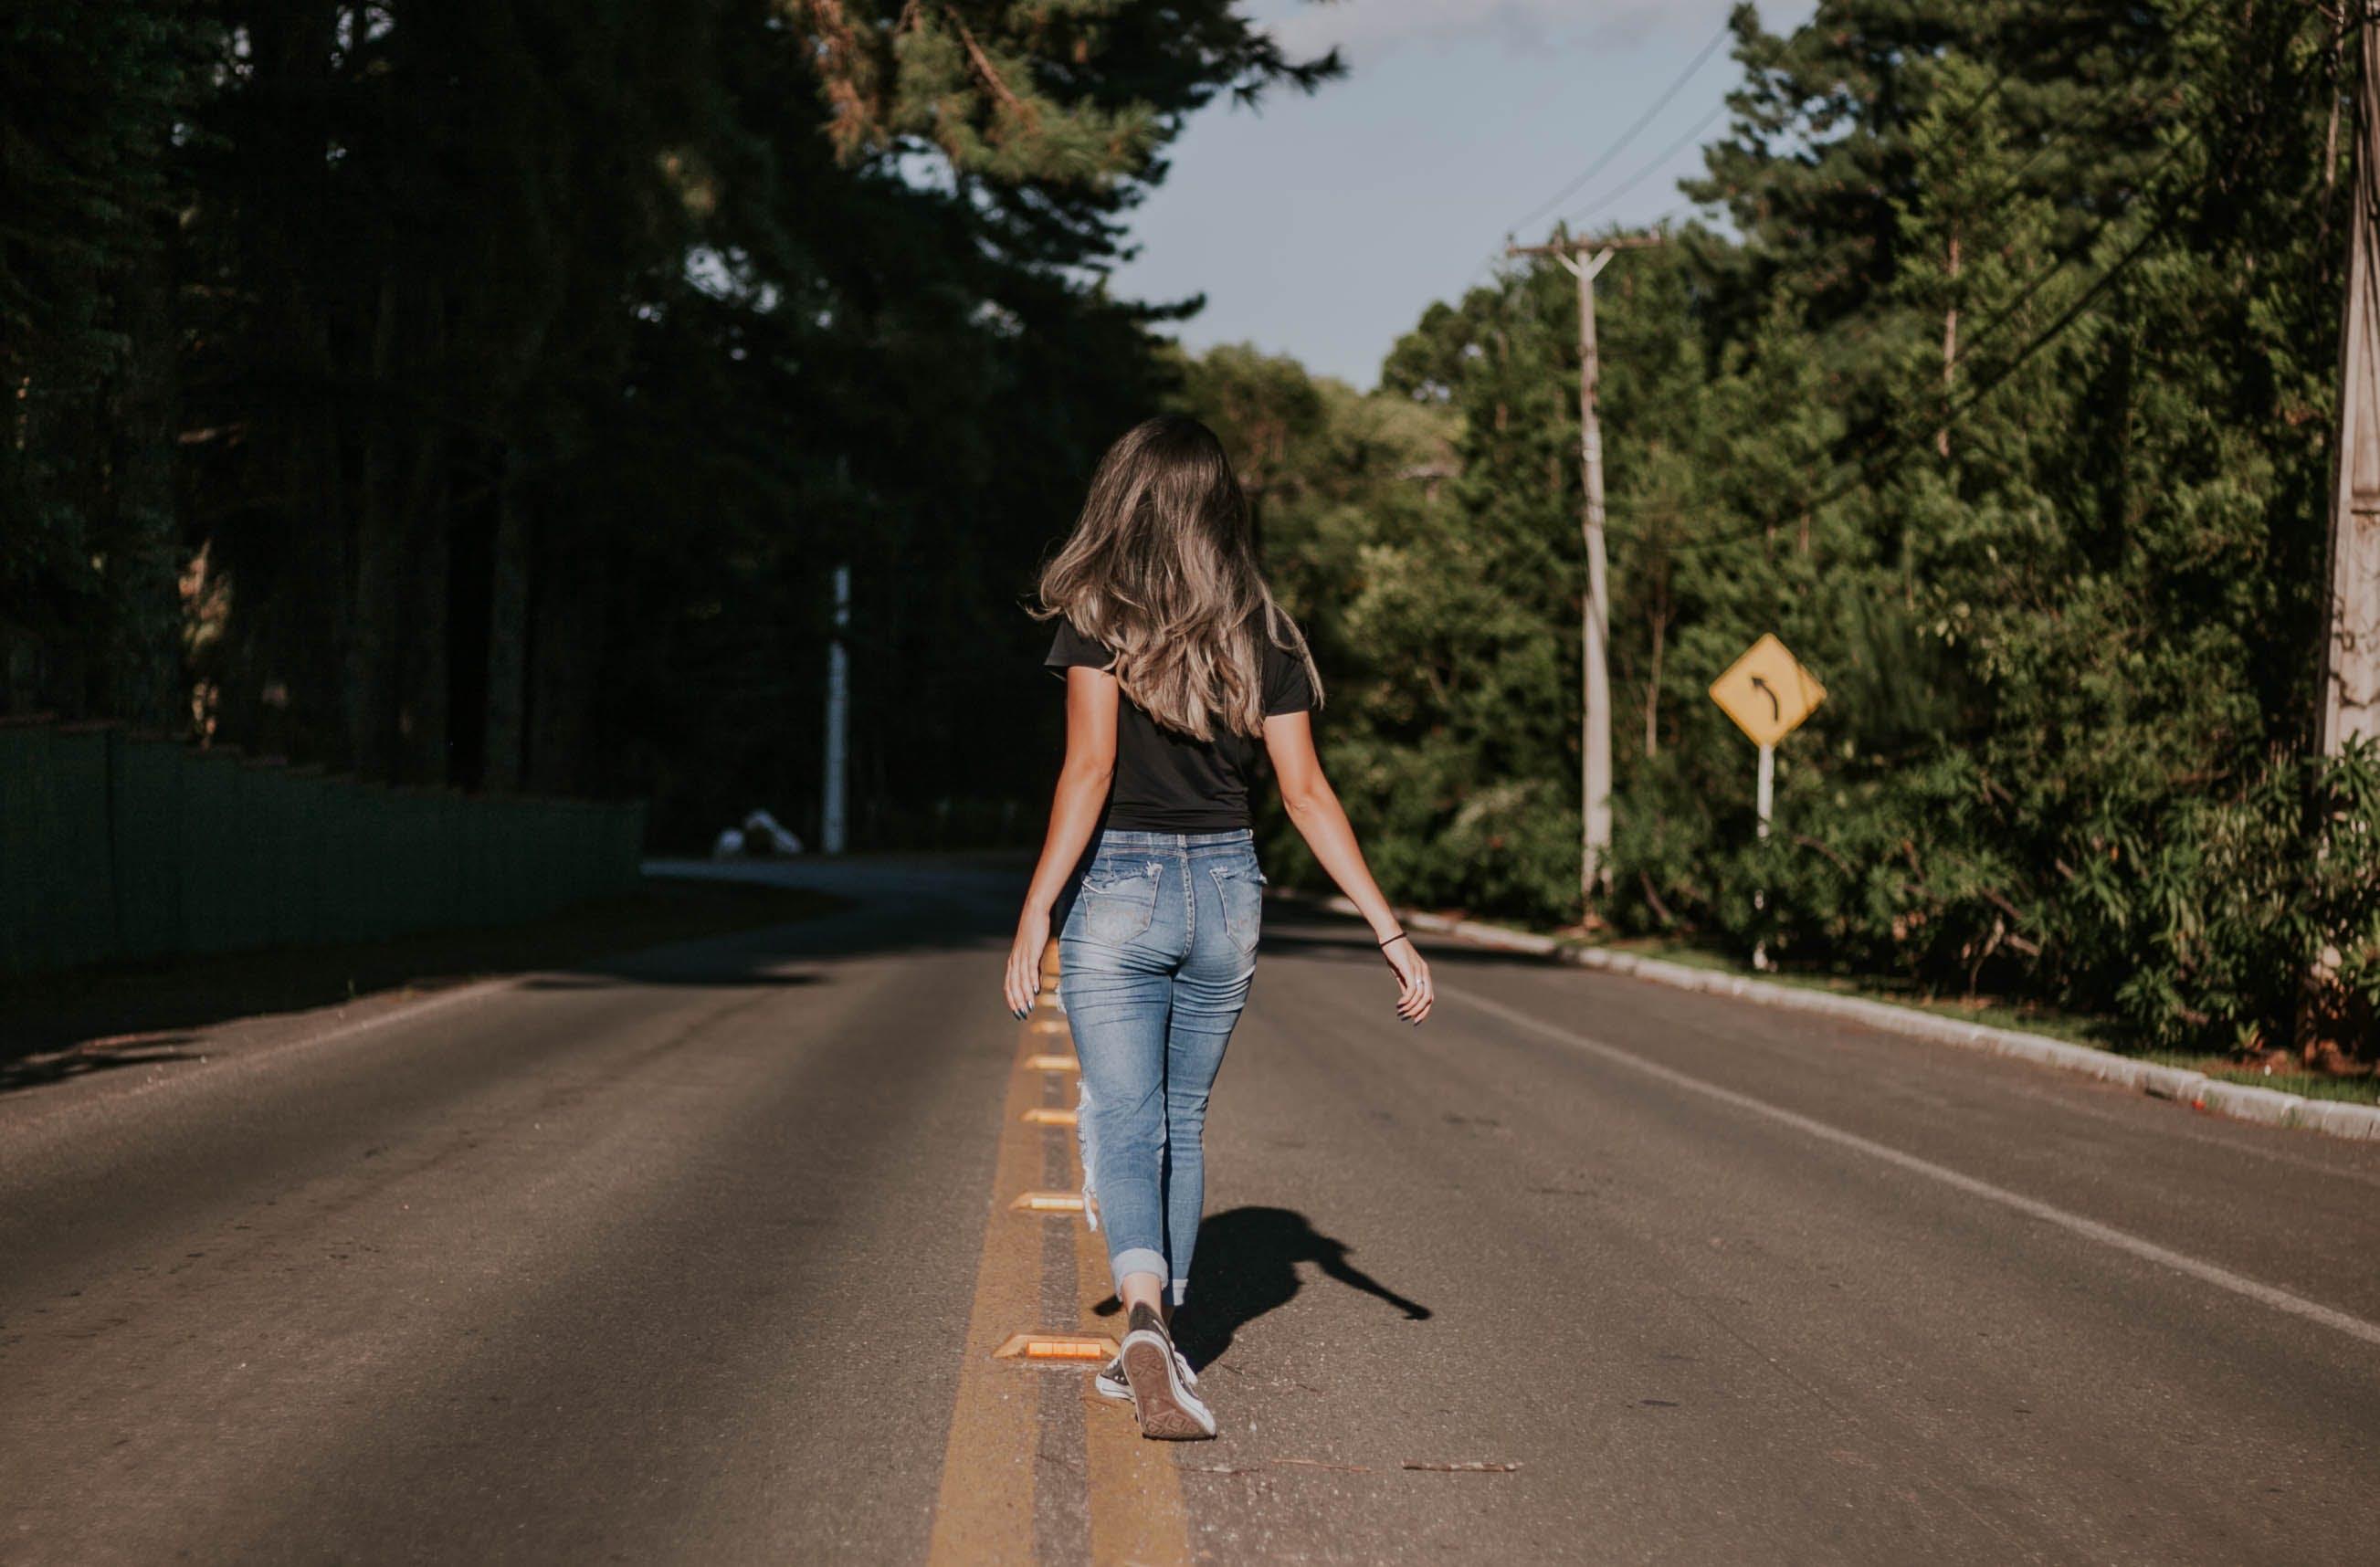 Kostenloses Stock Foto zu asphalt, bäume, bewegung, denim jeans